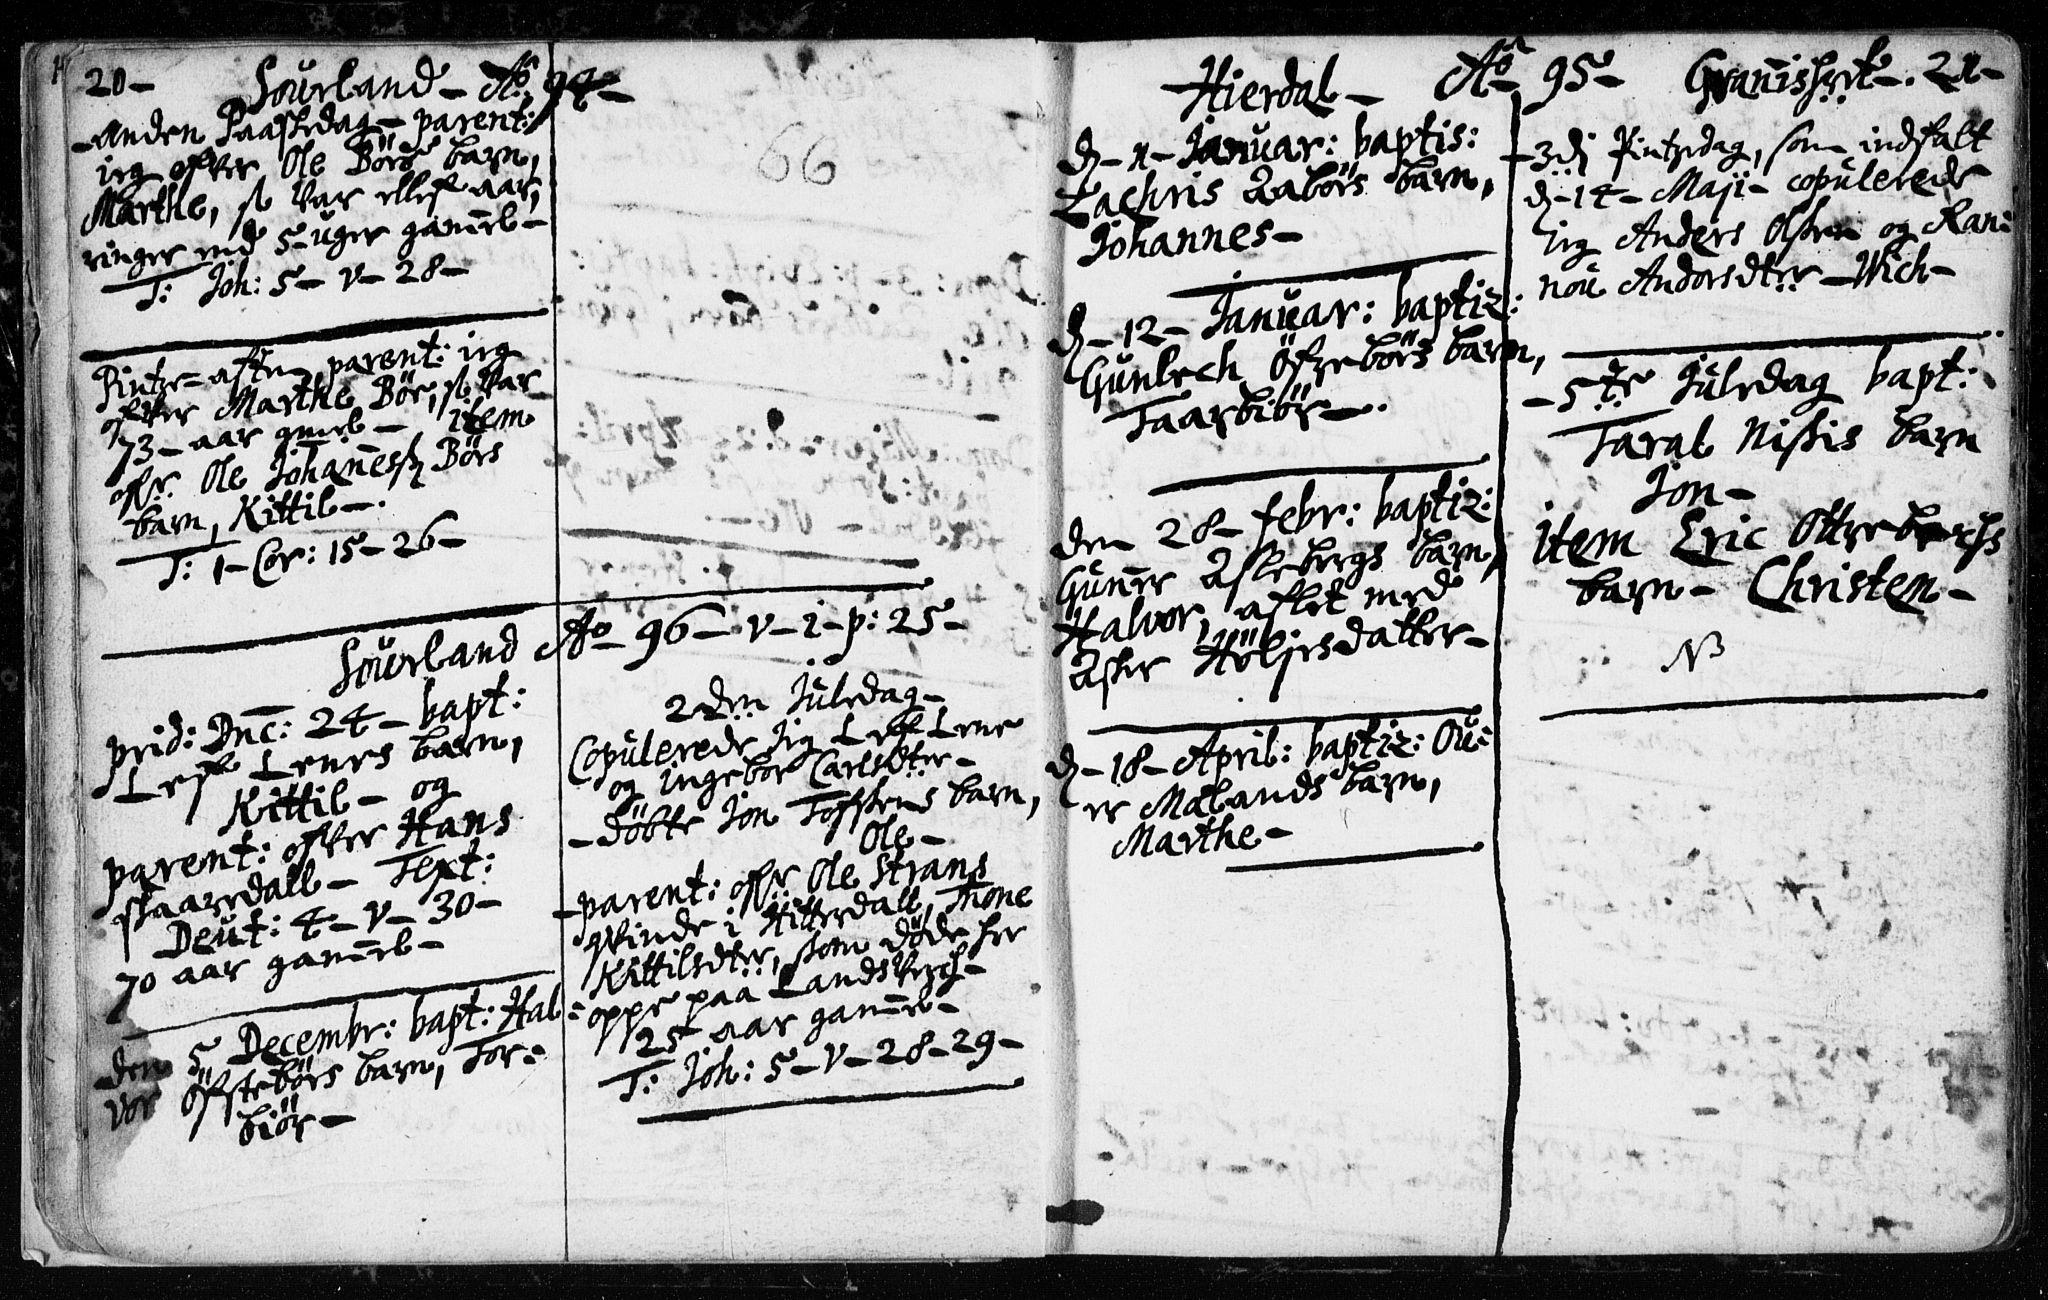 SAKO, Hjartdal kirkebøker, F/Fa/L0001: Ministerialbok nr. I 1, 1685-1714, s. 20-21